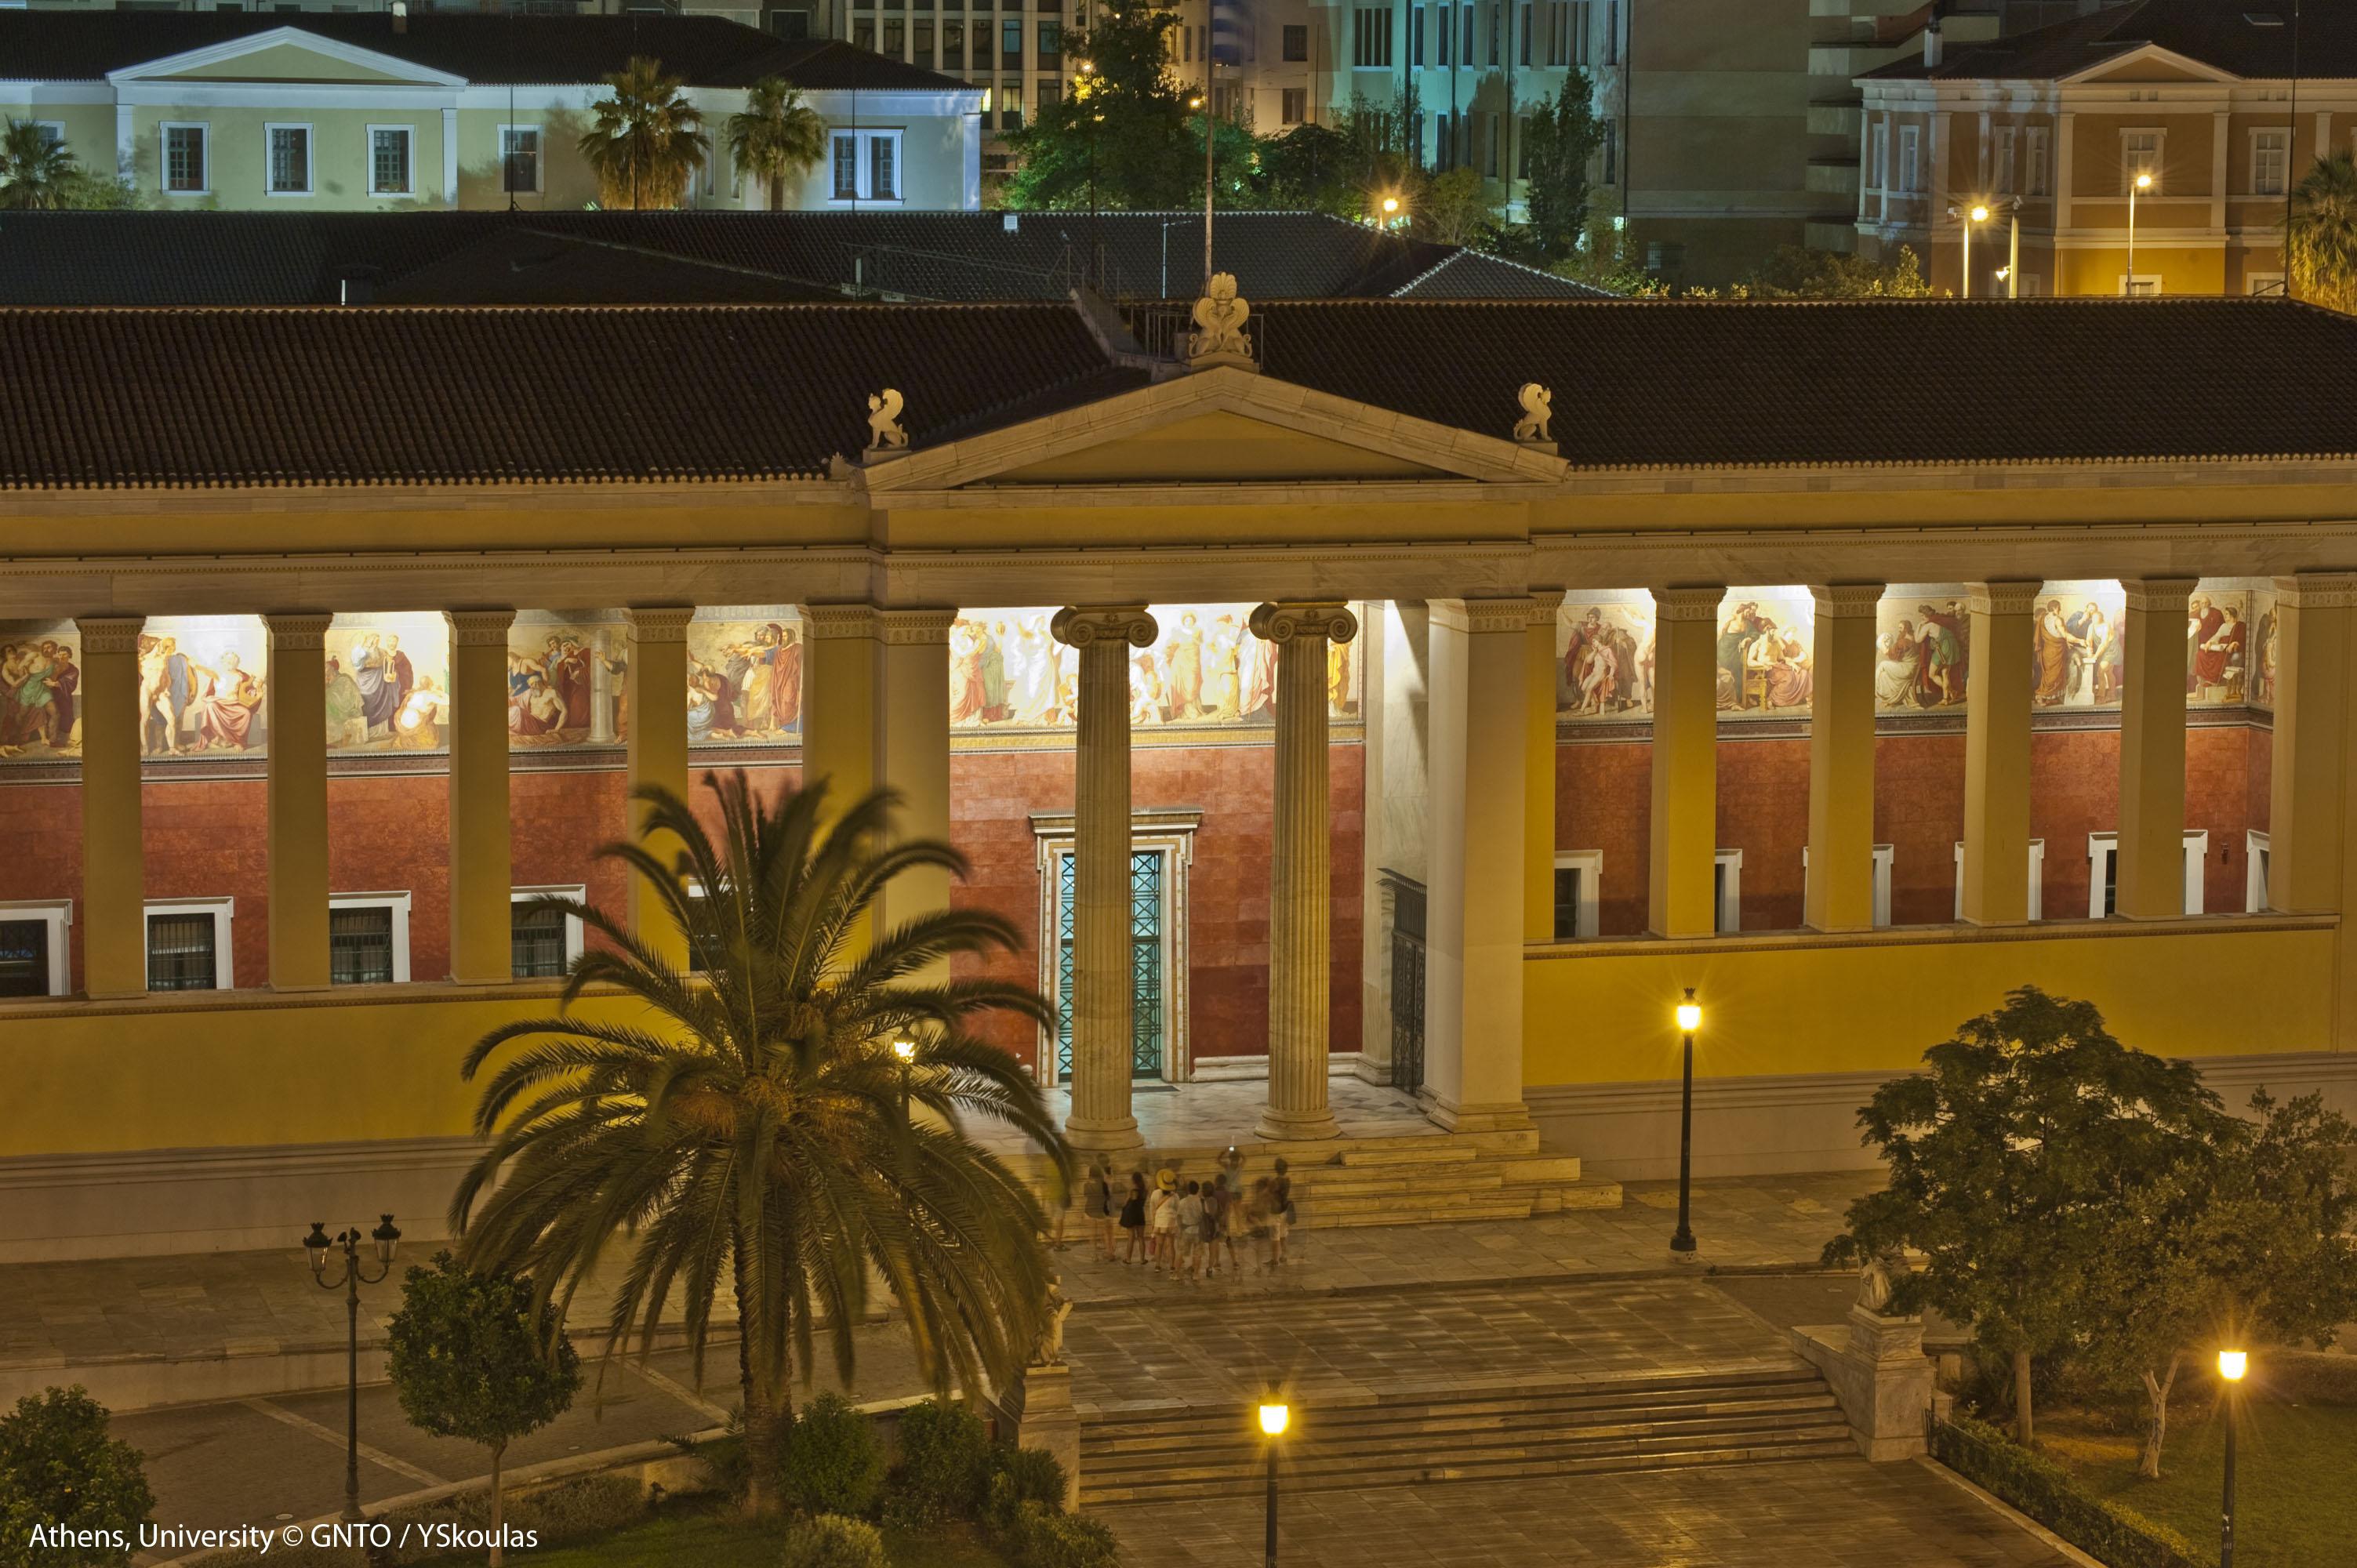 Athens_University_2251_YSkoulas.jpg